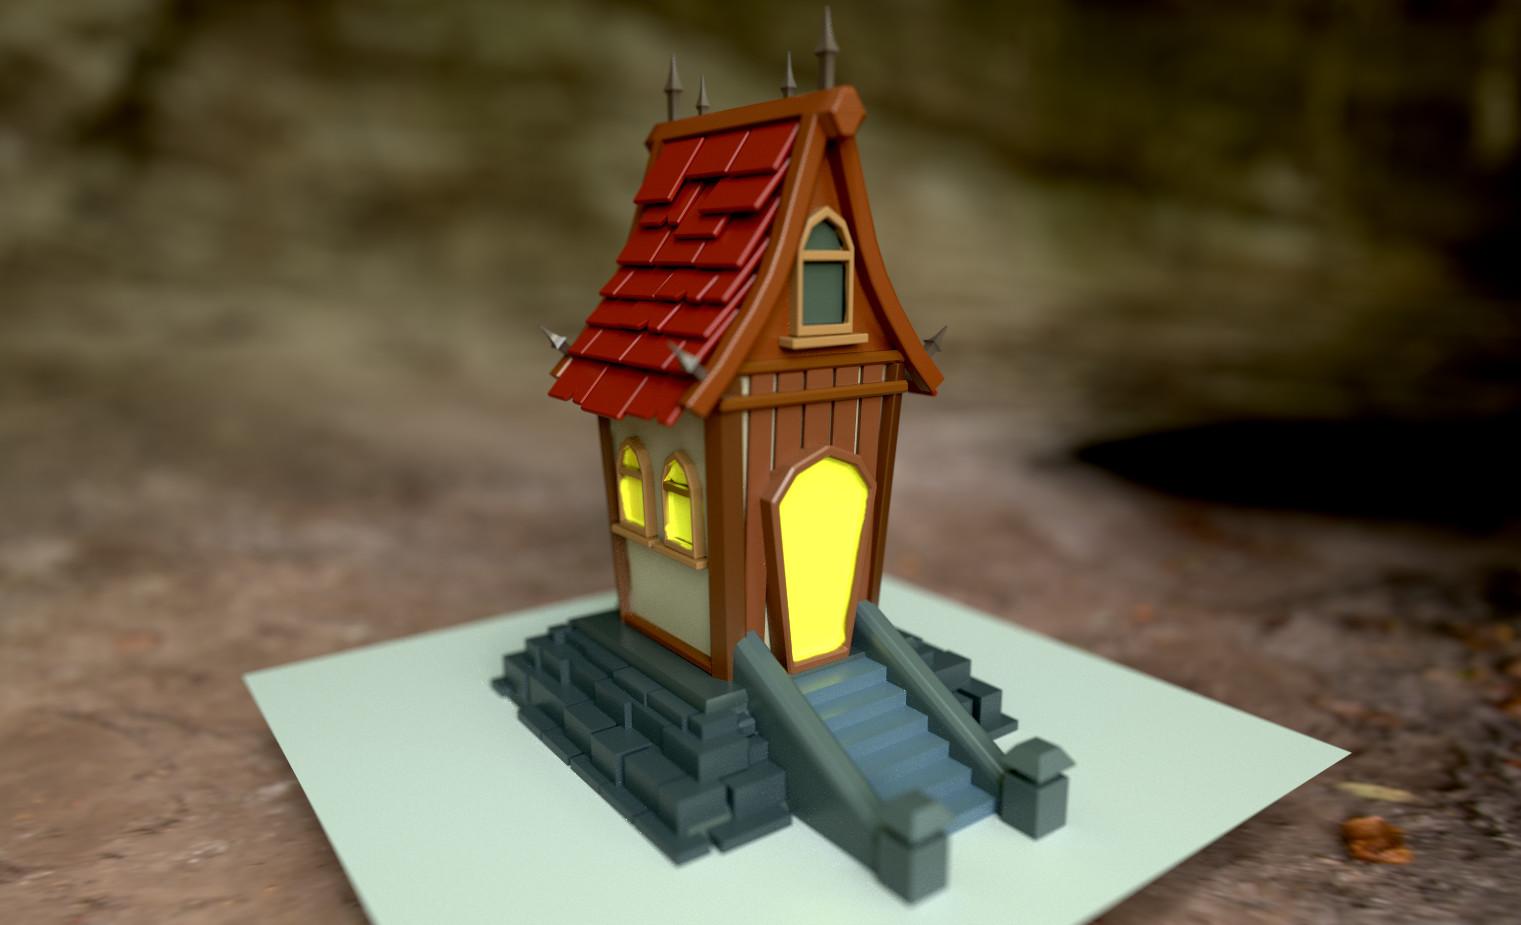 Stylized House (Maya + Substance Painter)